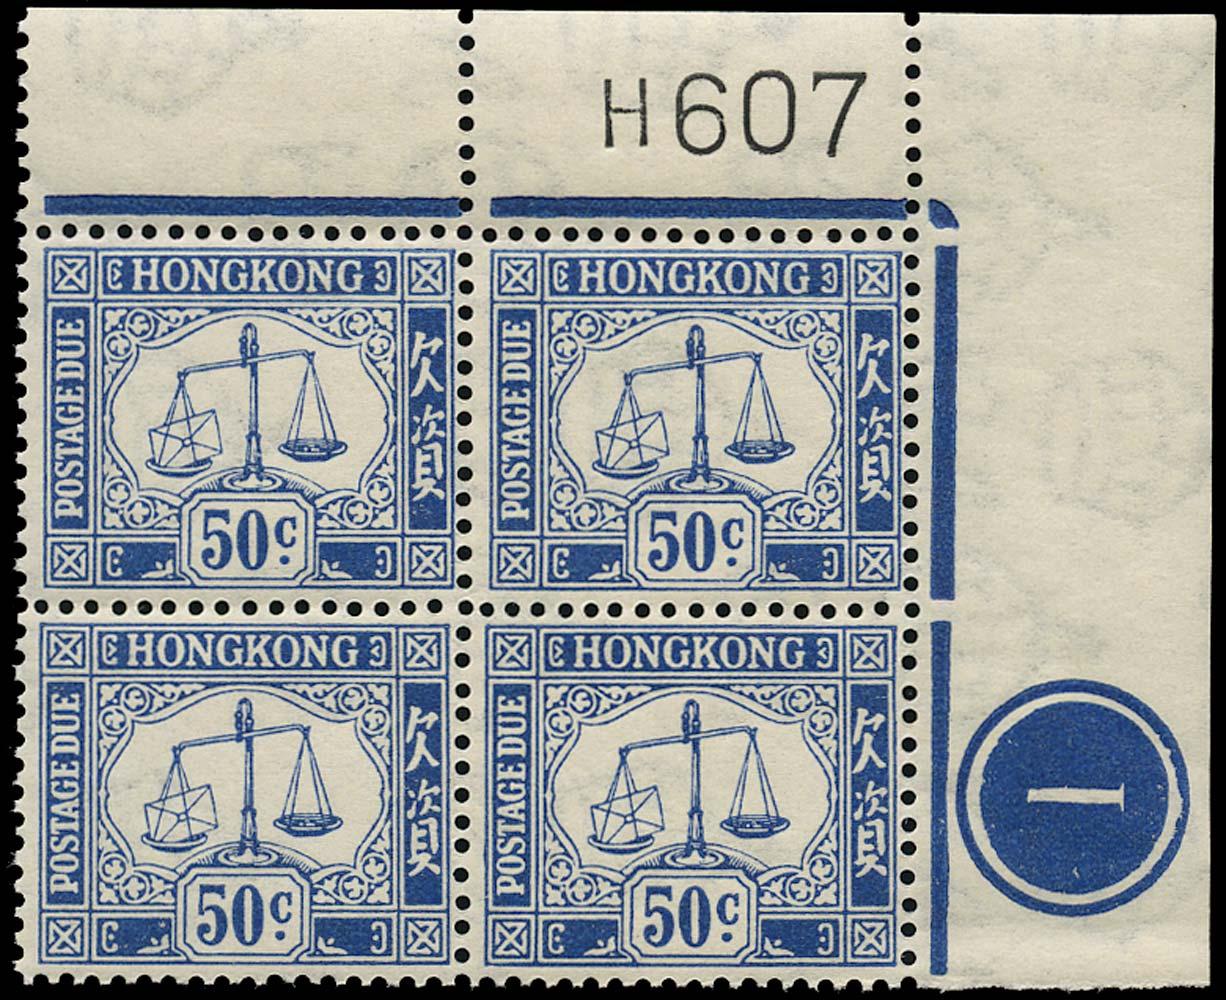 HONG KONG 1938  SGD12 Postage Due 50c blue Script watermark unmounted